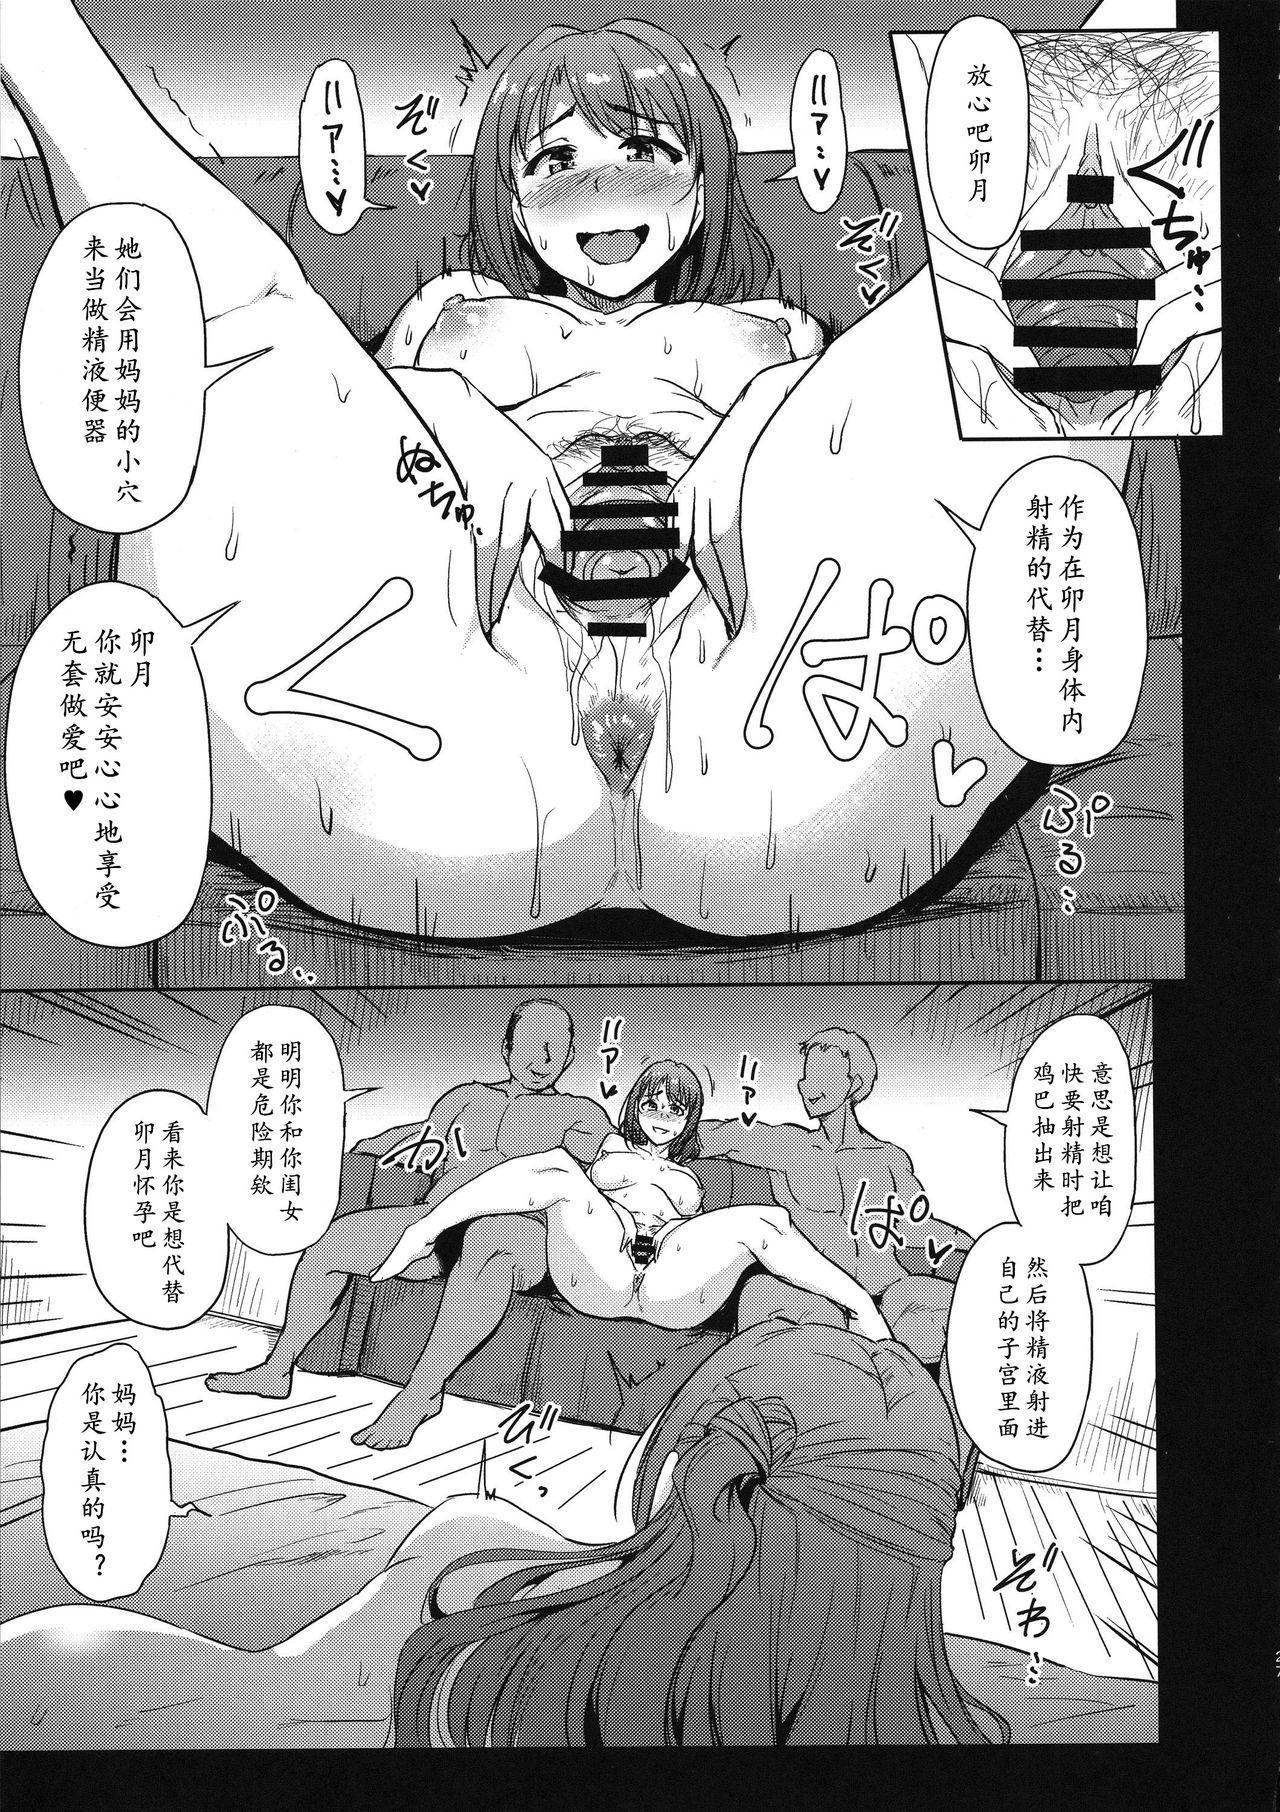 (C97) [MillionLove (Yayo)] Perfect Lesson 0 - Shimamura-ke Kanraku Hen (THE IDOLM@STER CINDERELLA GIRLS) [Chinese] [黄记汉化组] 26